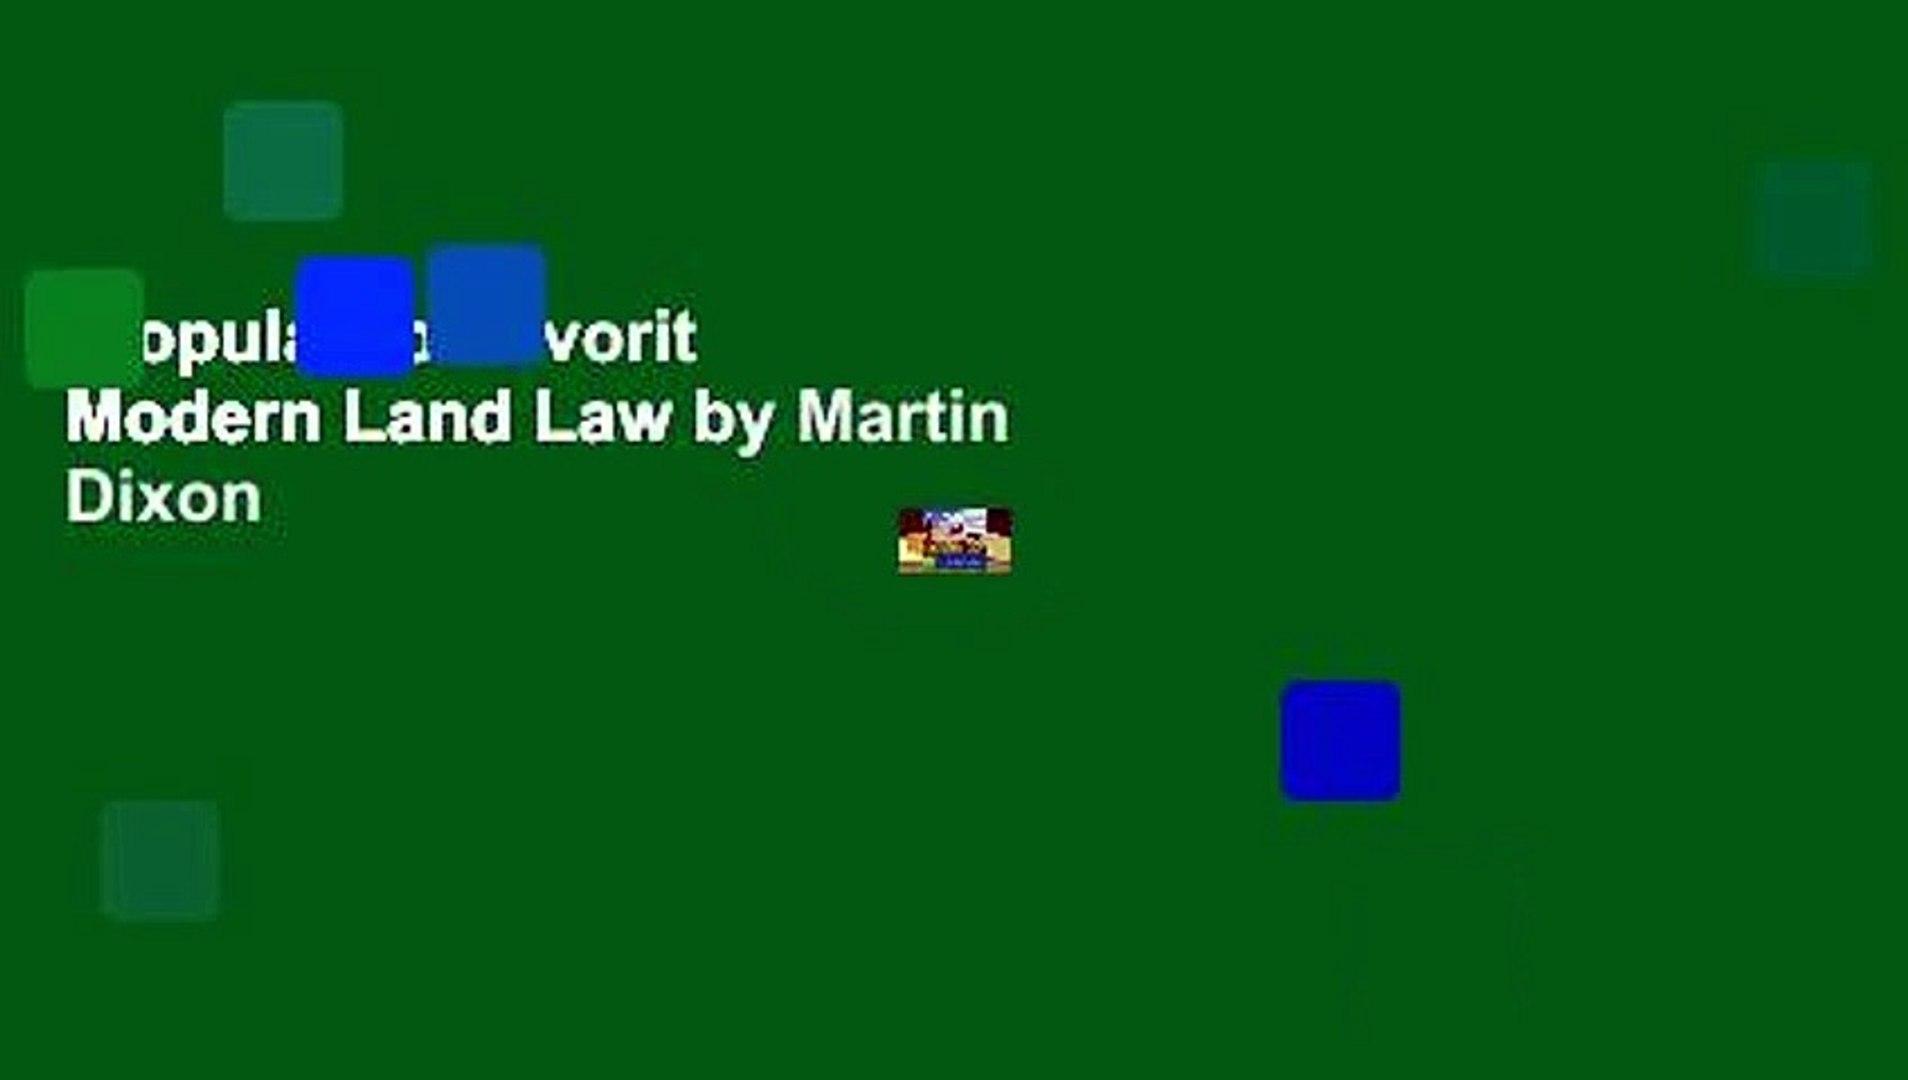 Modern Land Law